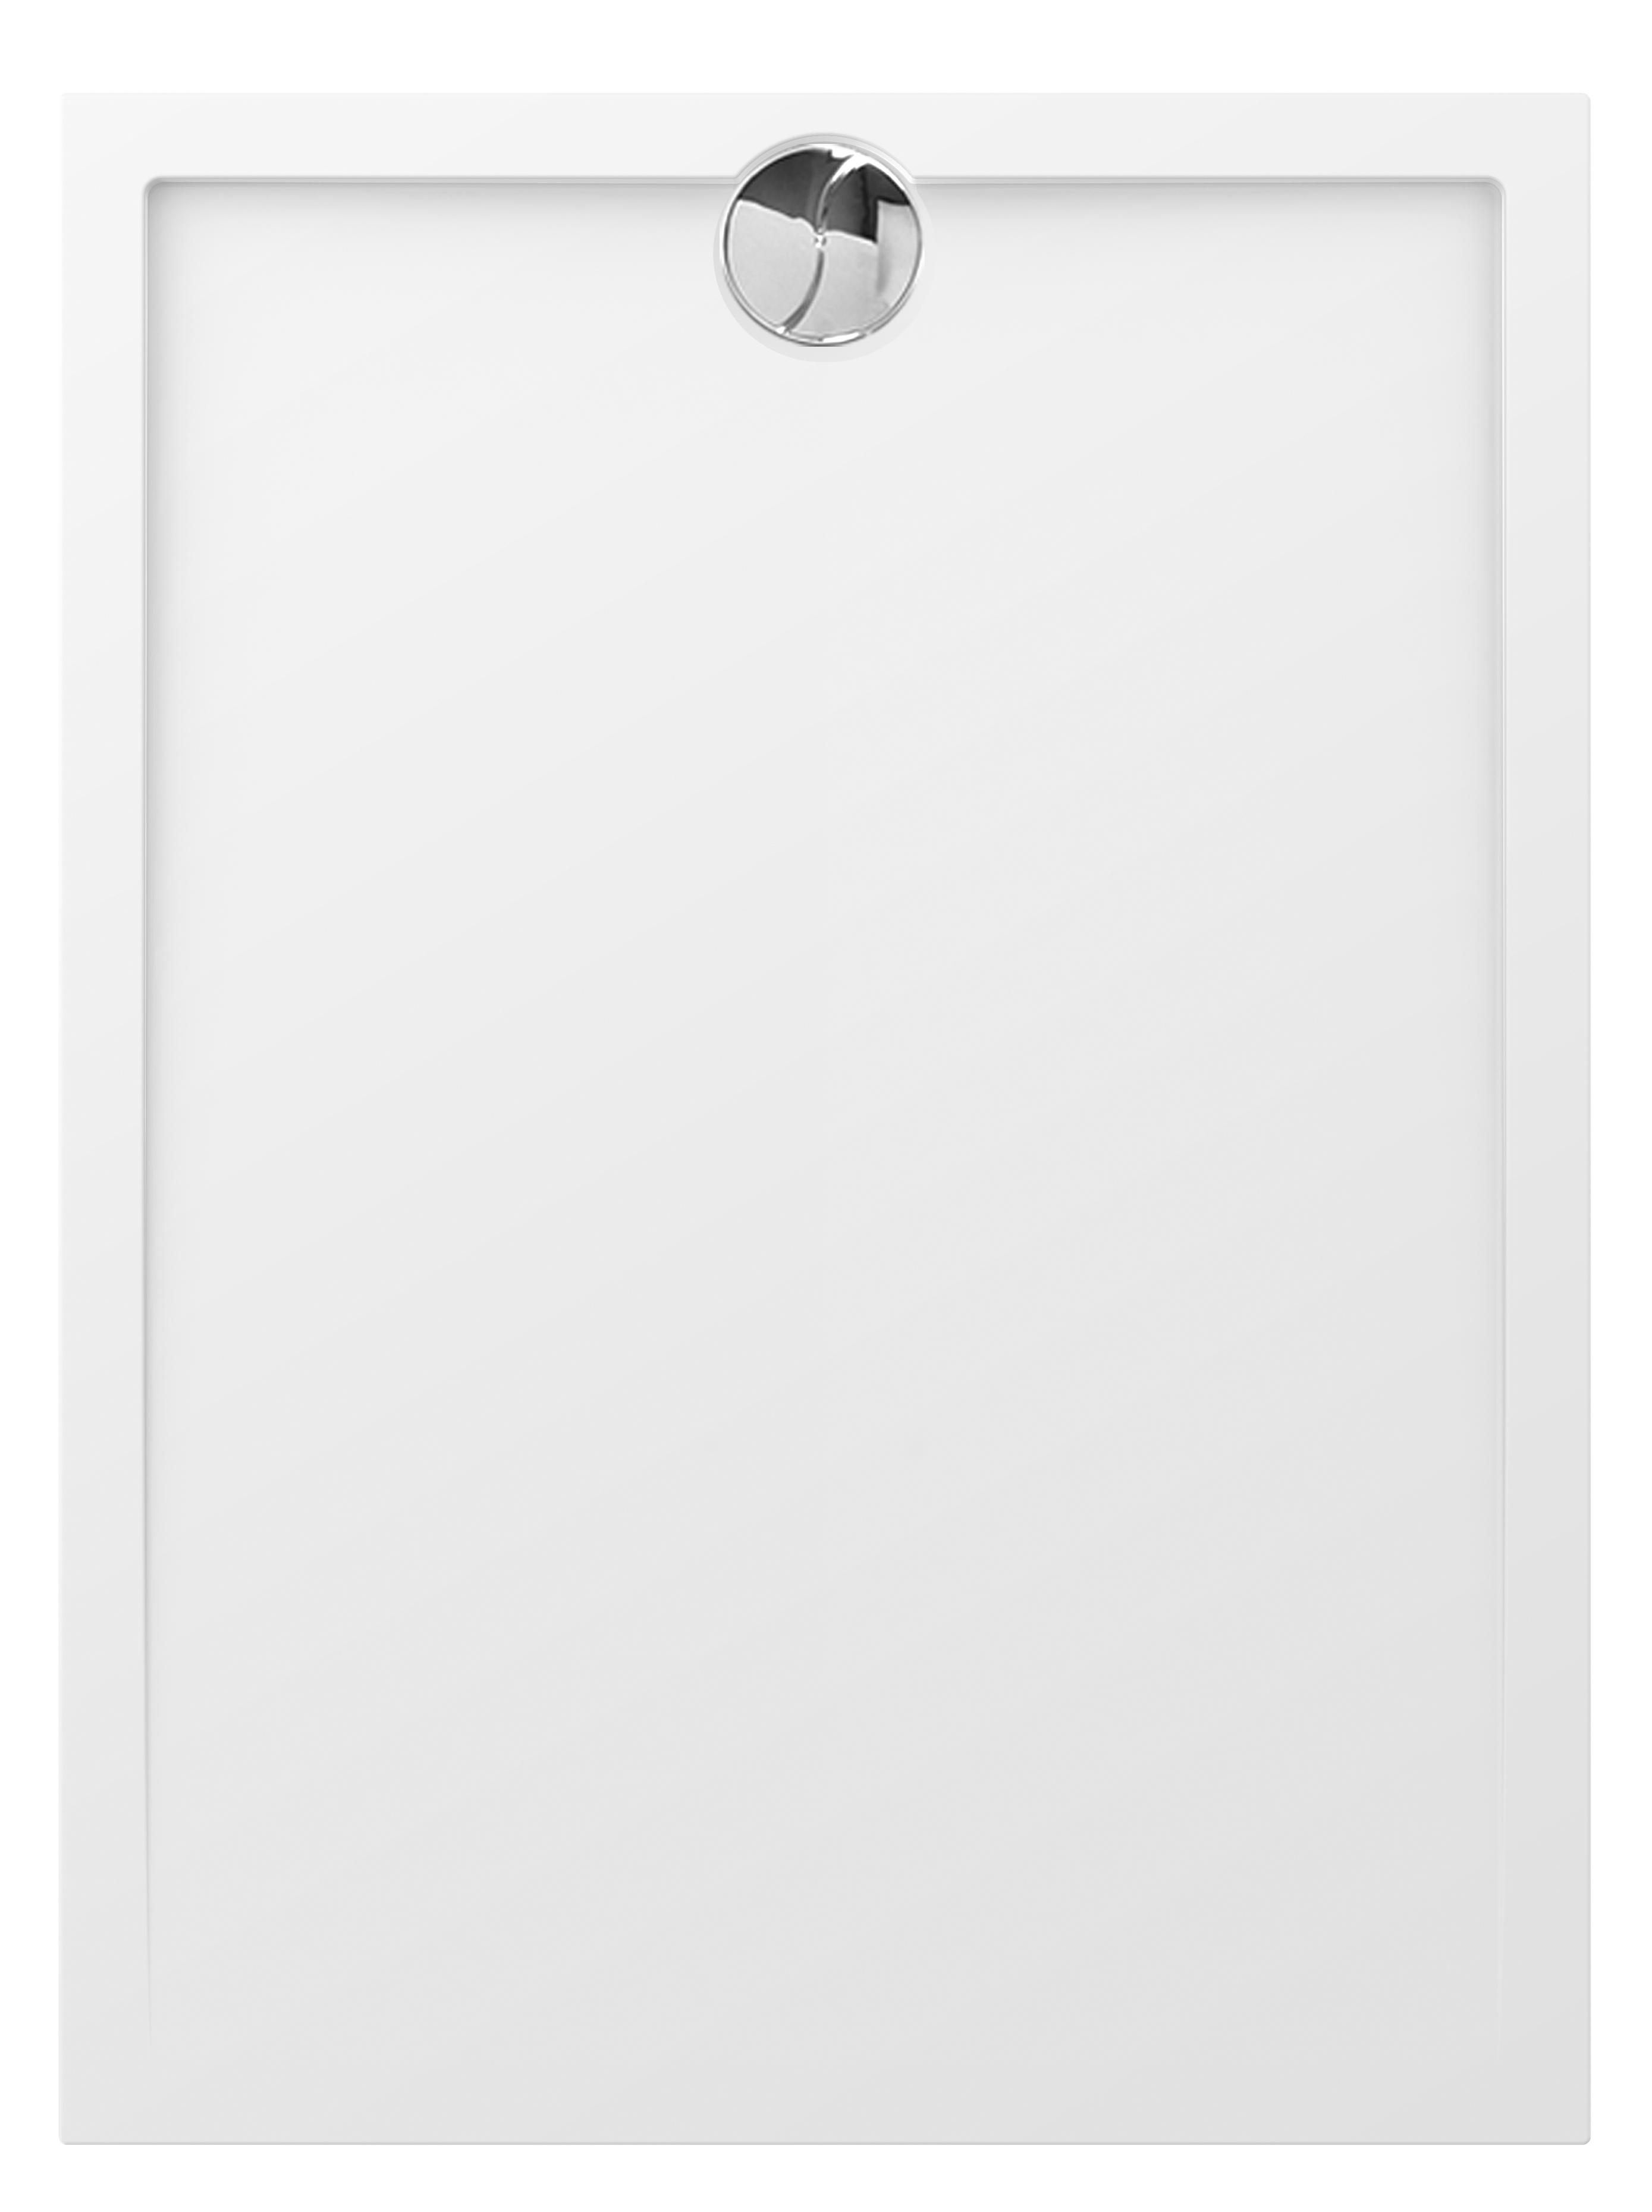 Receveur extra plat 120x90 top receveur extra plat x castorama avec receveur douche extra plat - Receveur de douche extra plat 120x90 ...